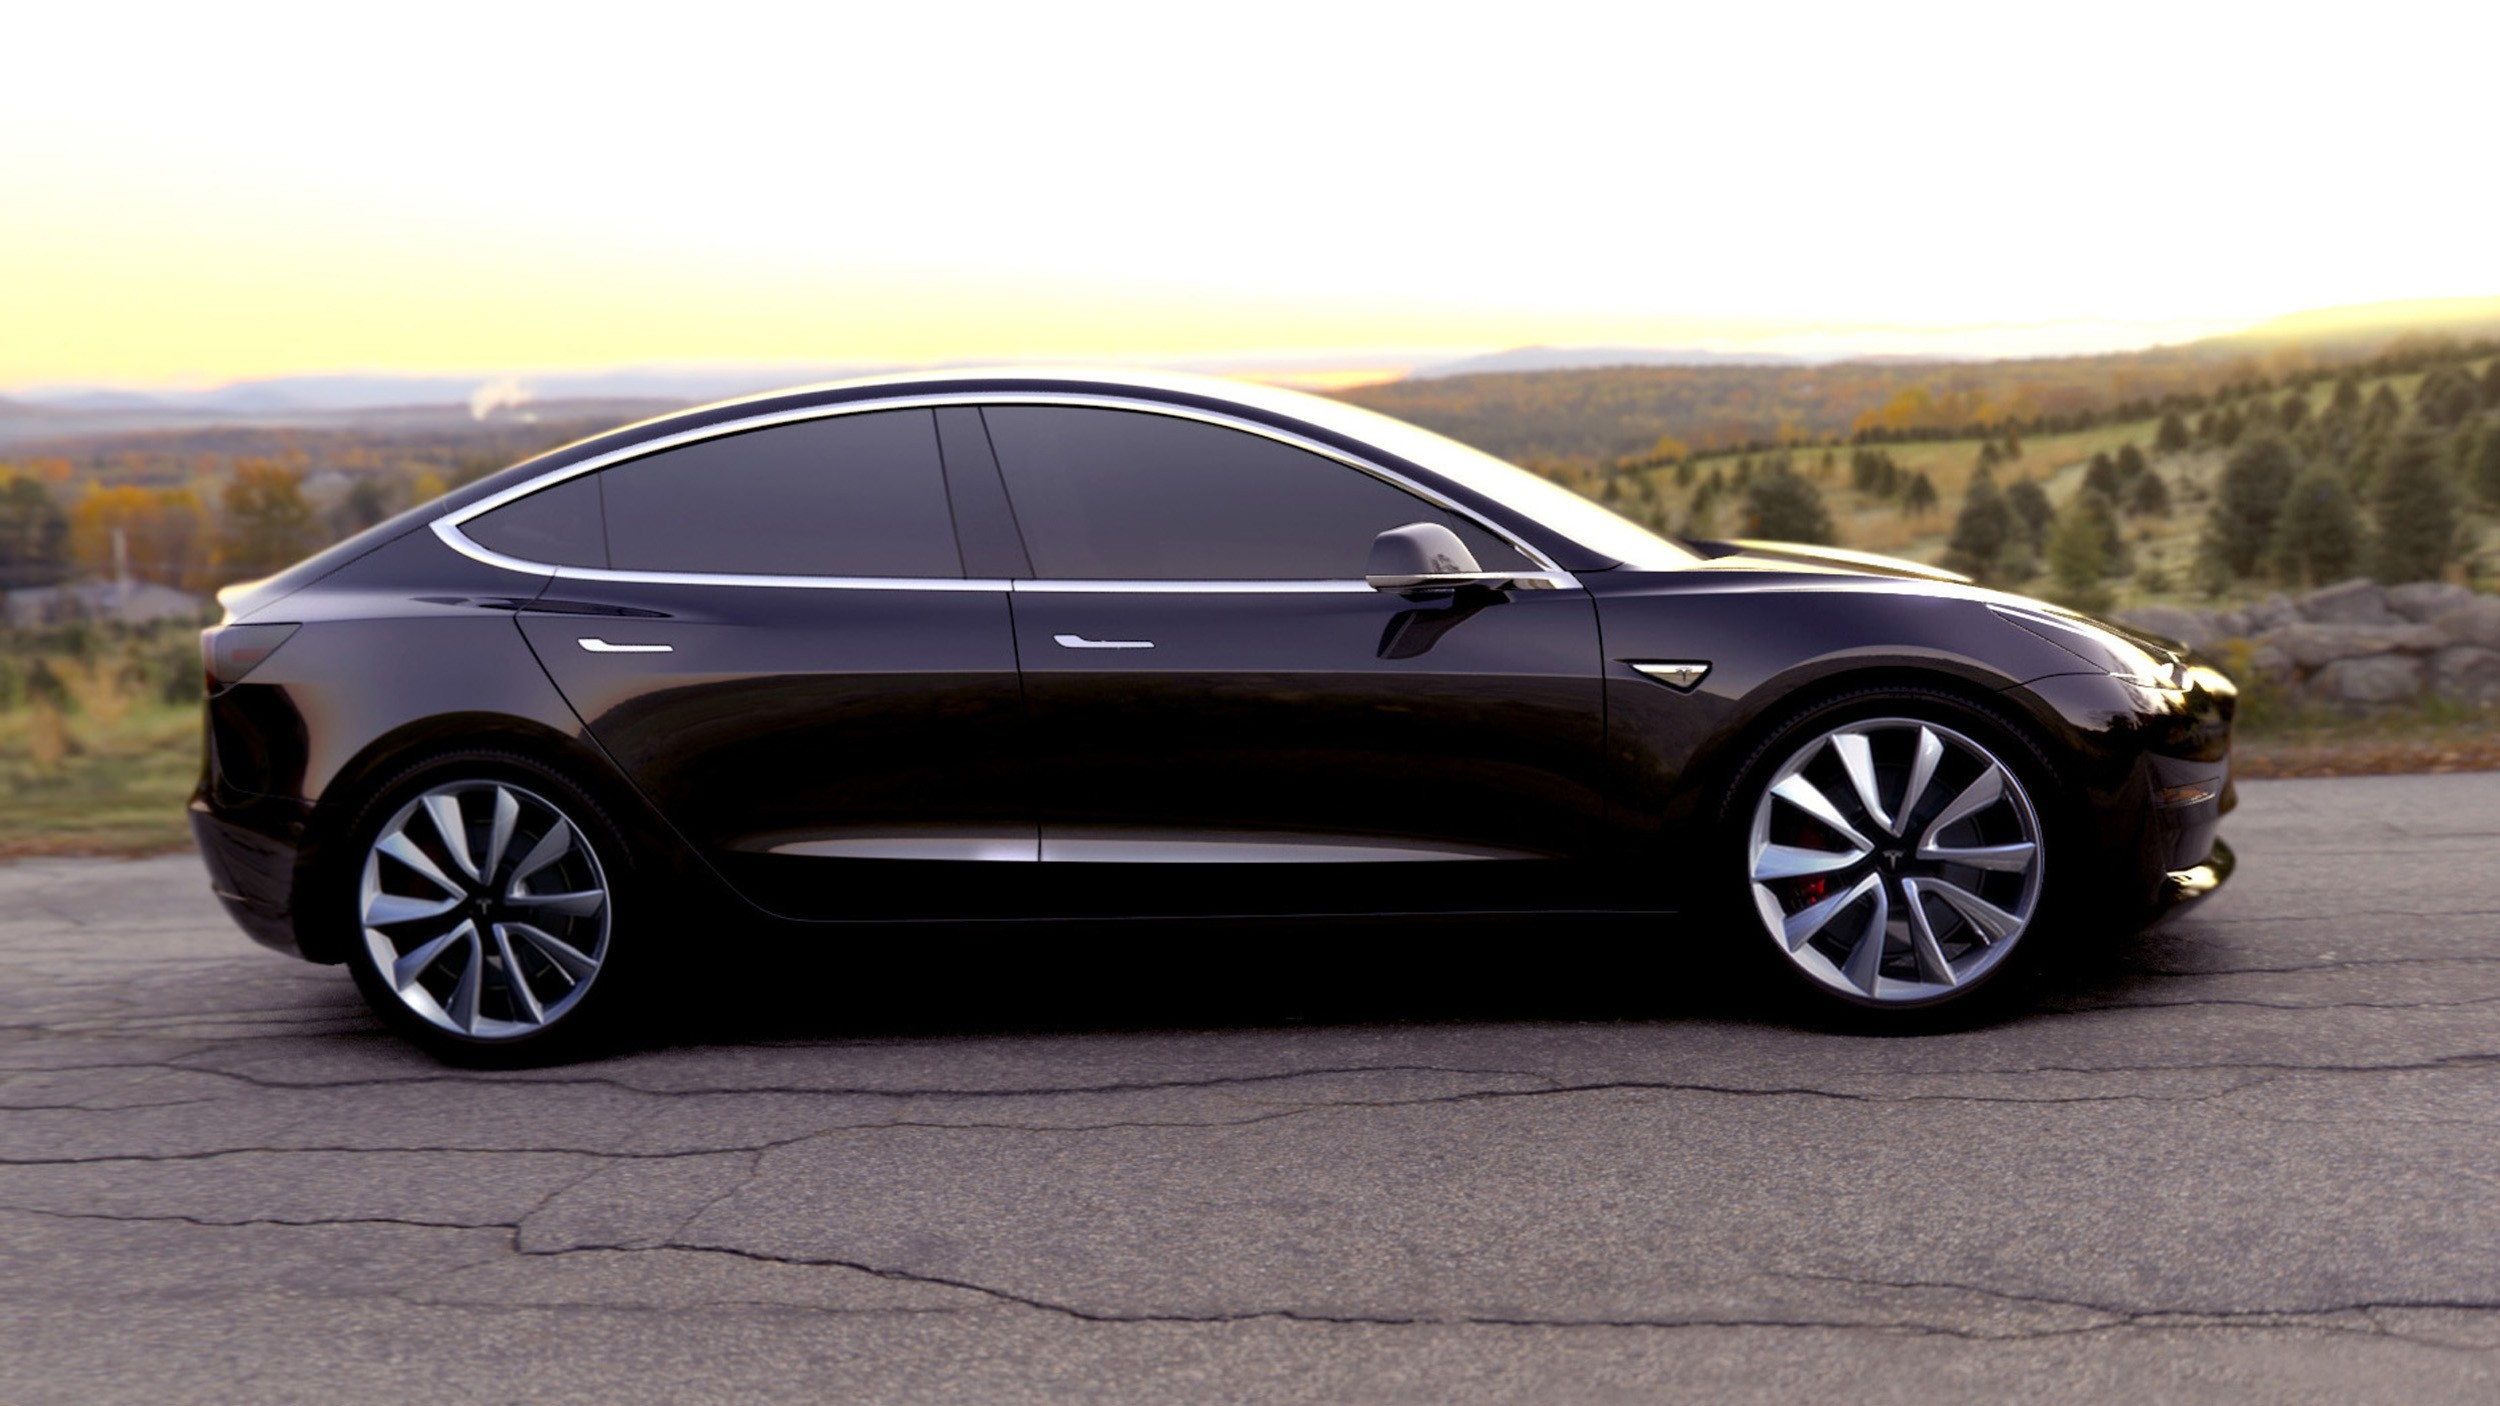 Tesla model 3 interior in broad daylight looks like for Interieur tesla